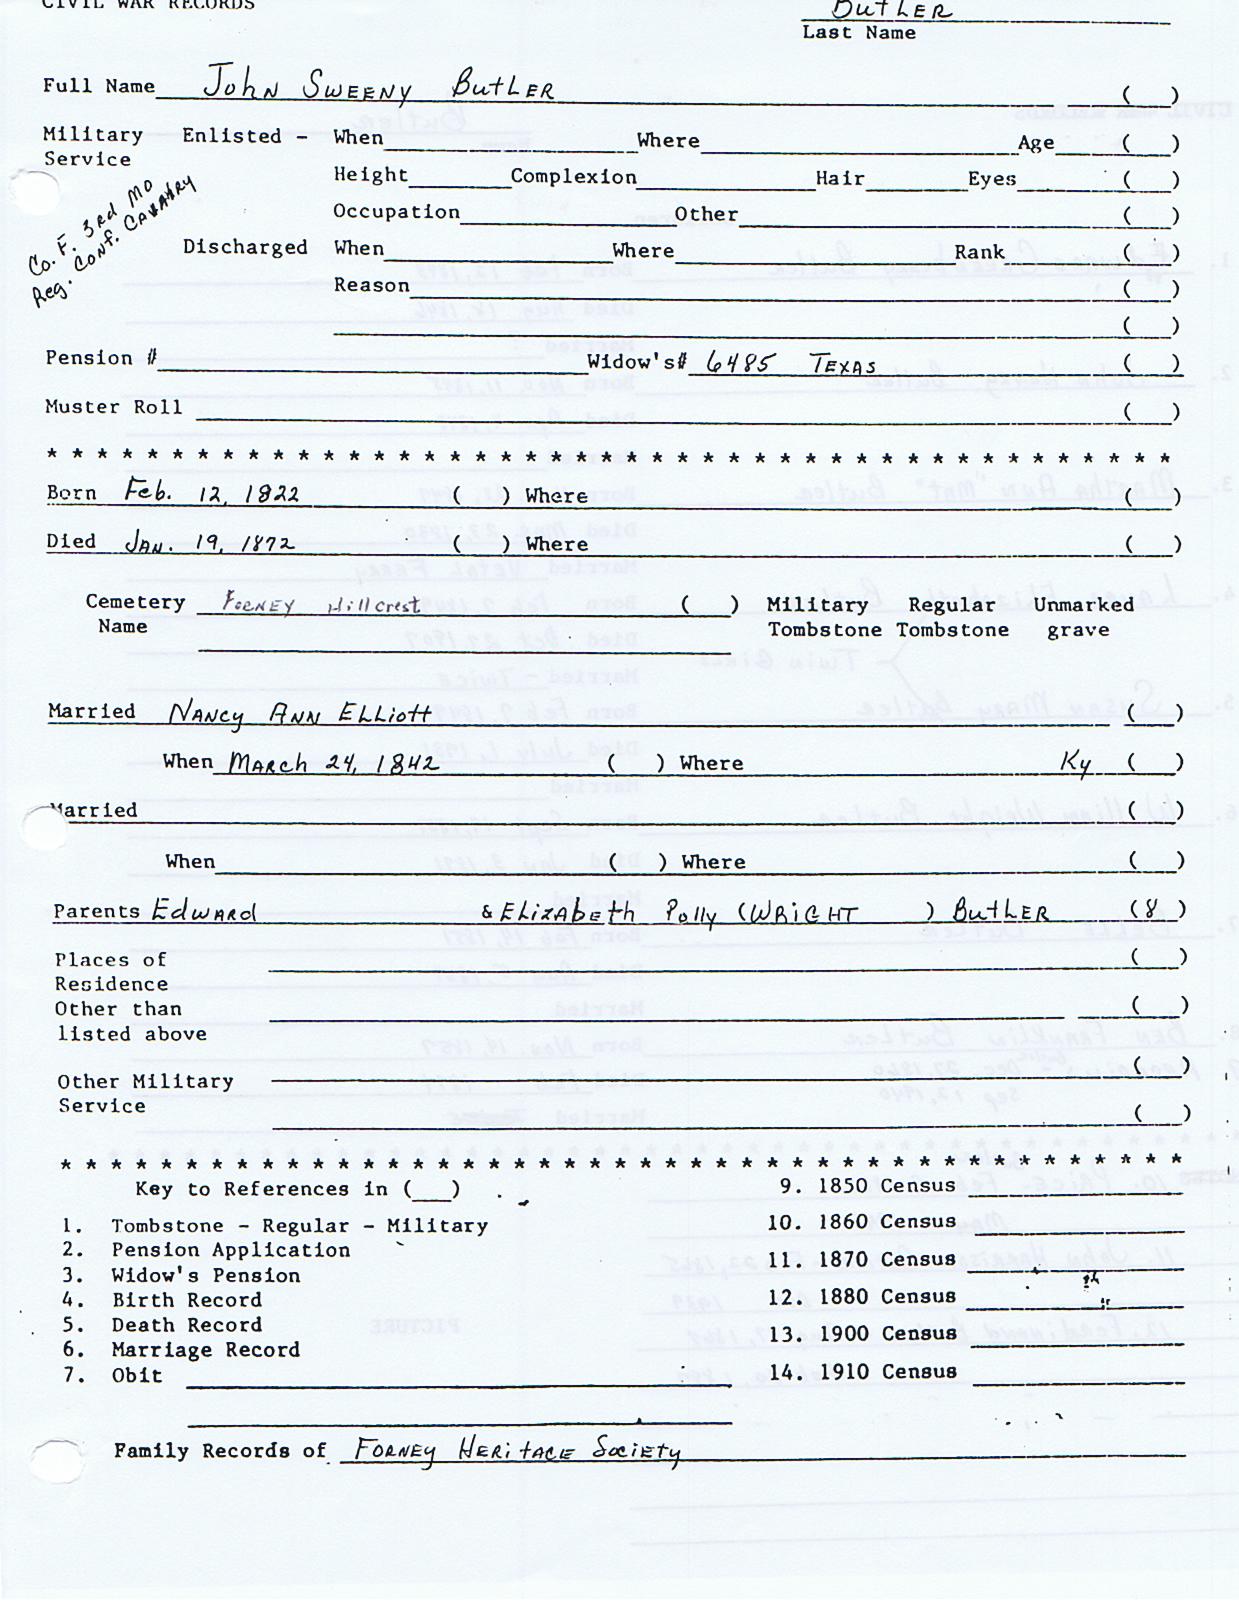 butler-kaufman_civil_war_records-3510